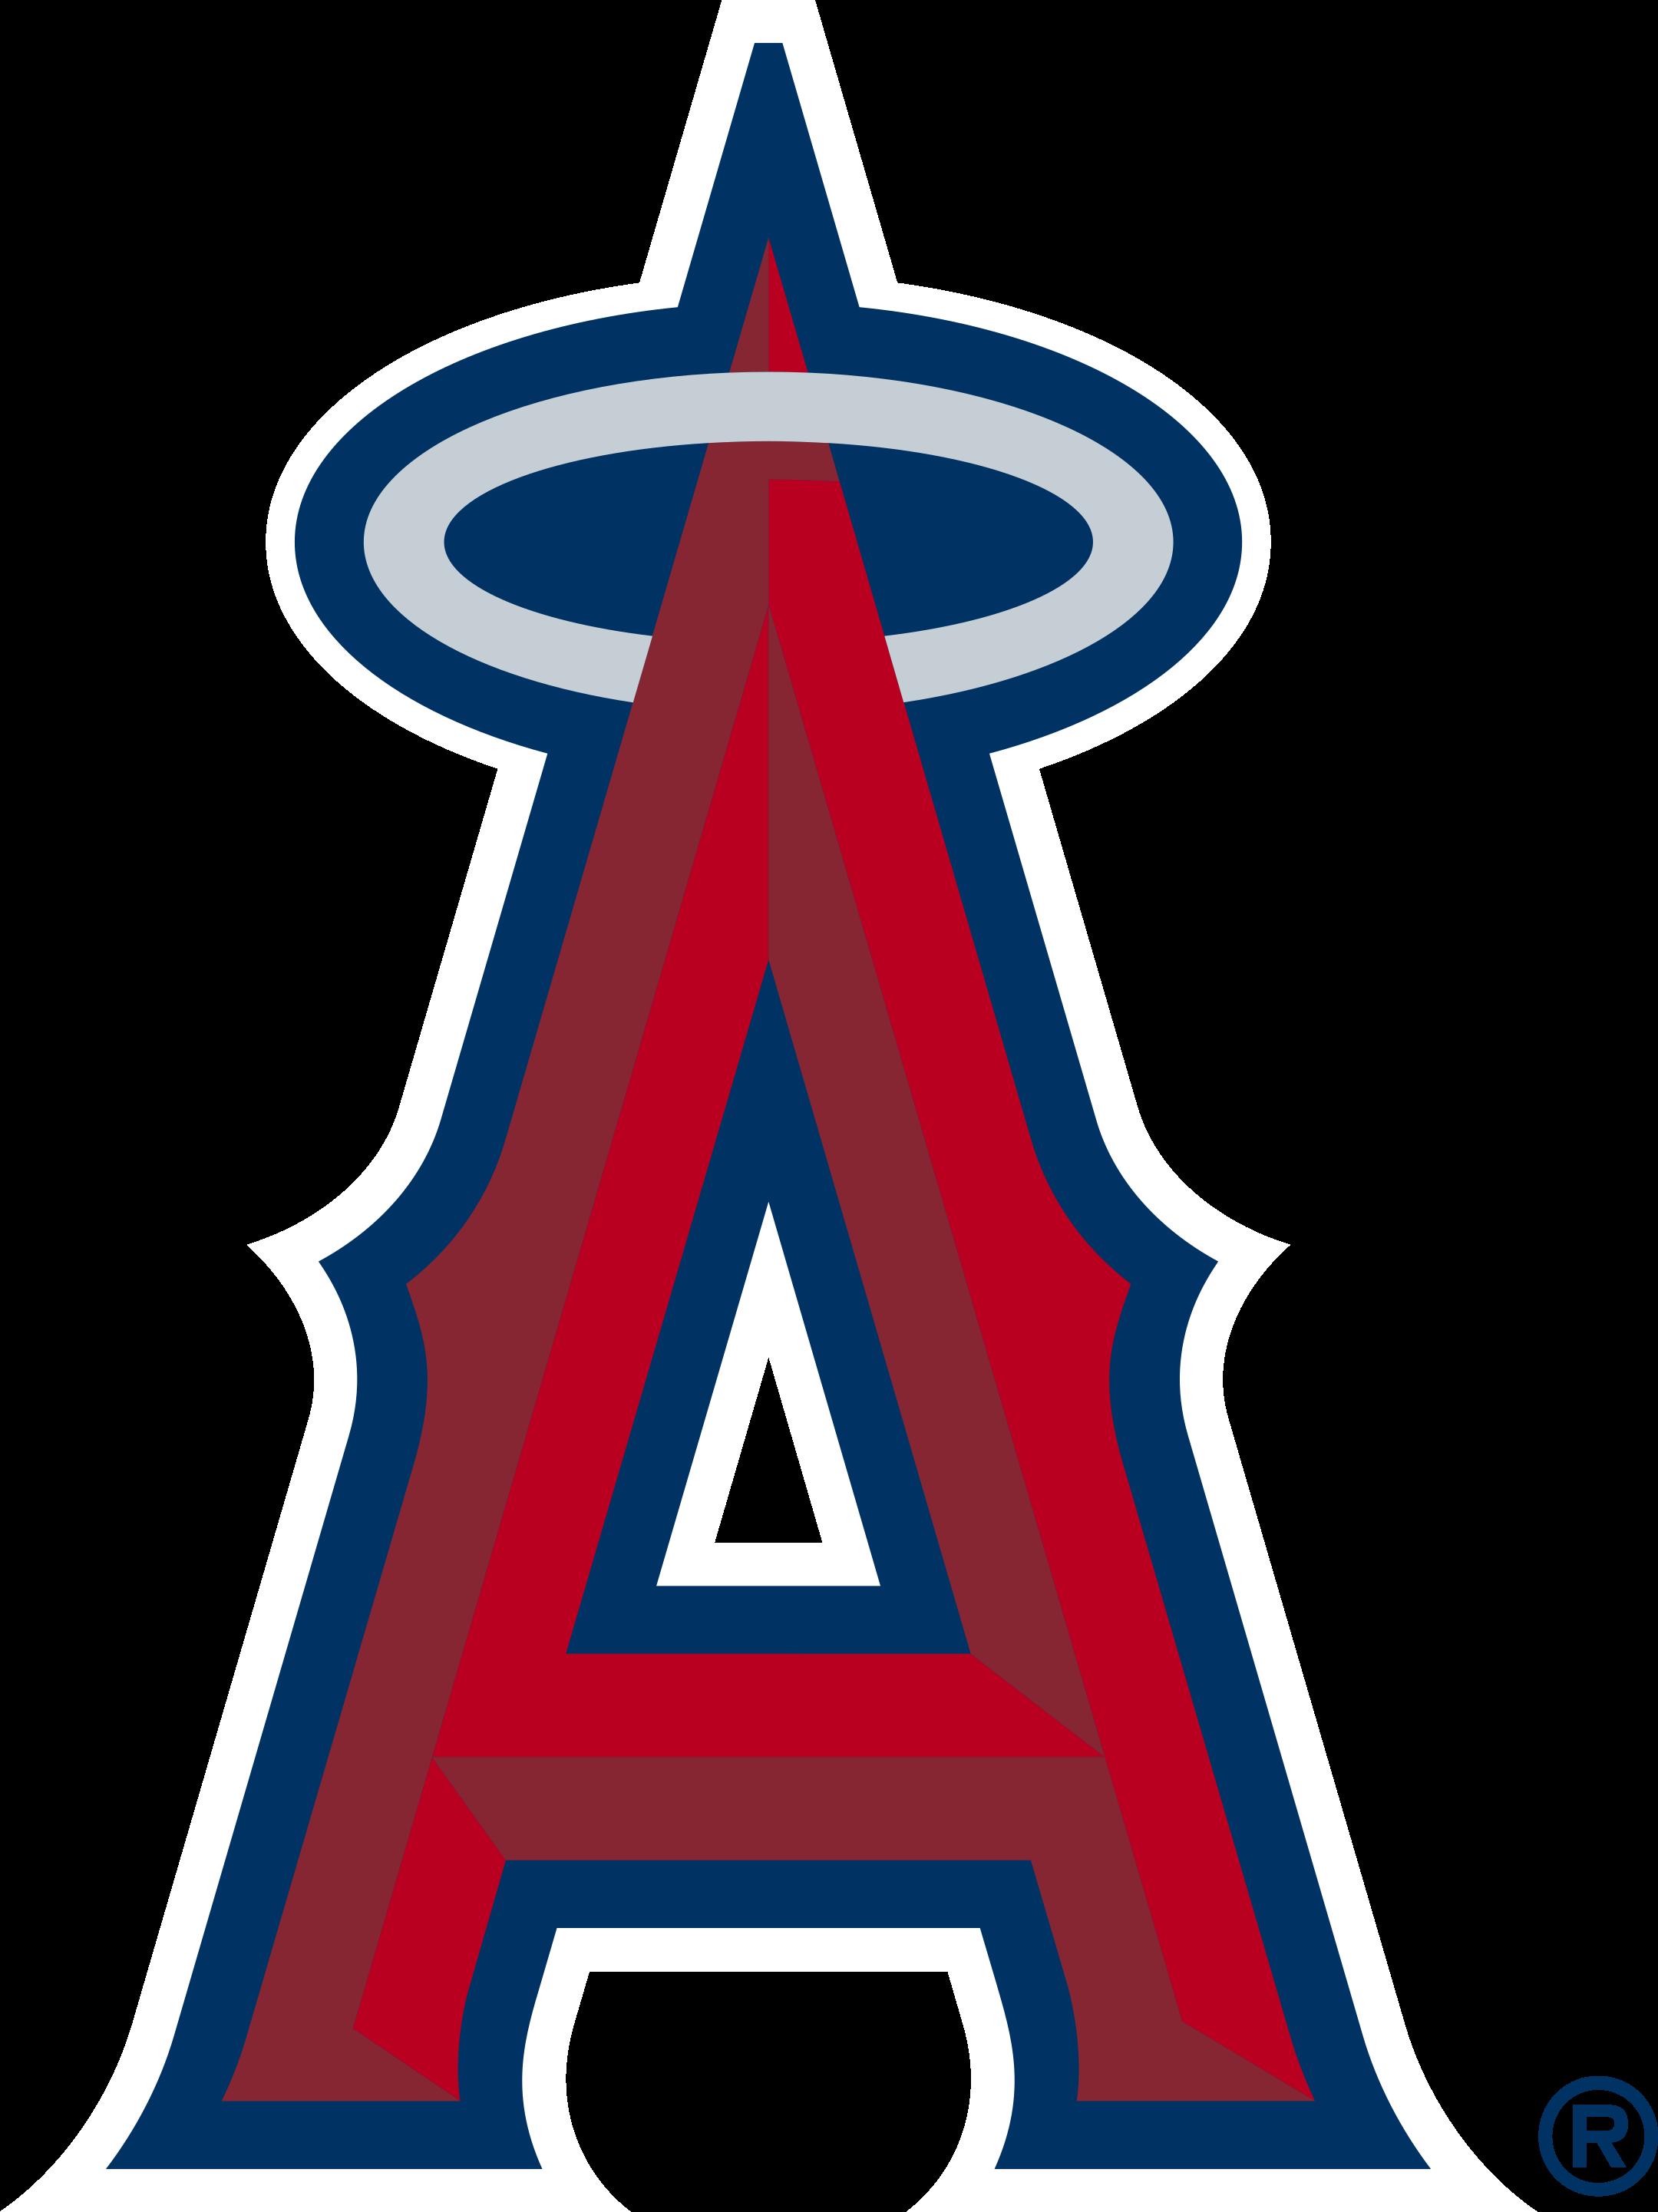 los angeles angels logo 1 - Los Angeles Angels Logo